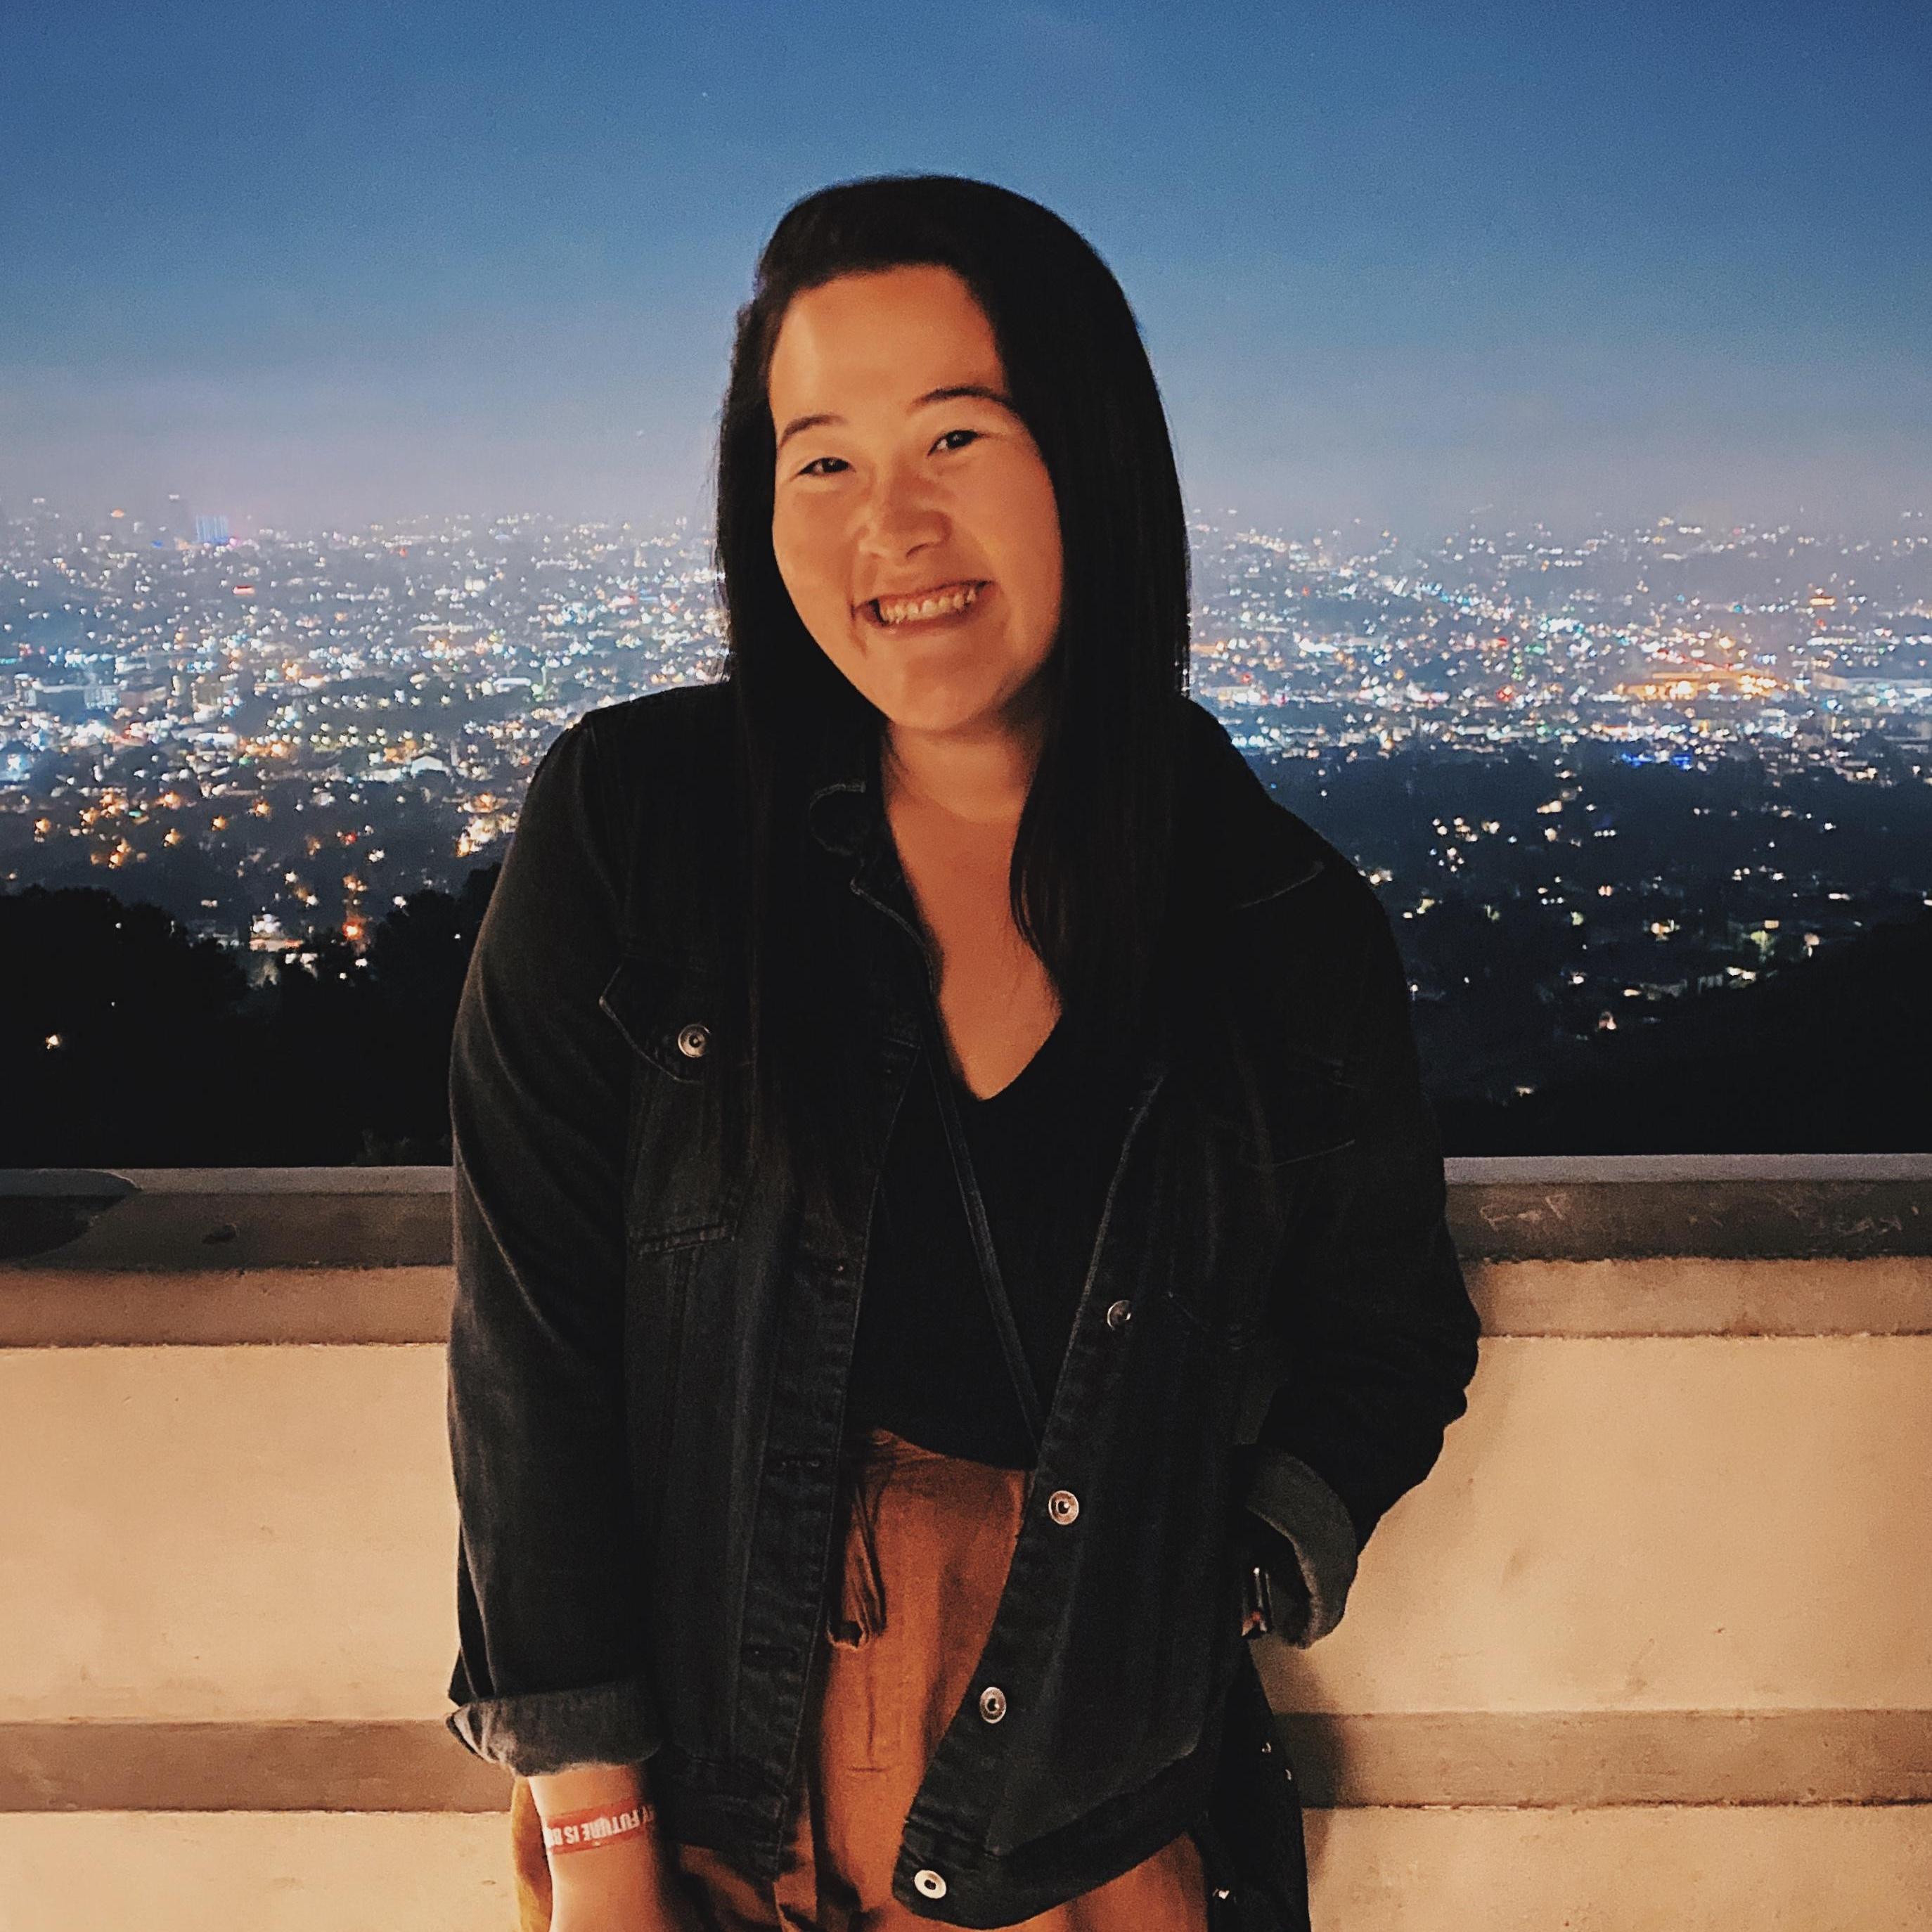 Ms. Okazaki's Profile Photo